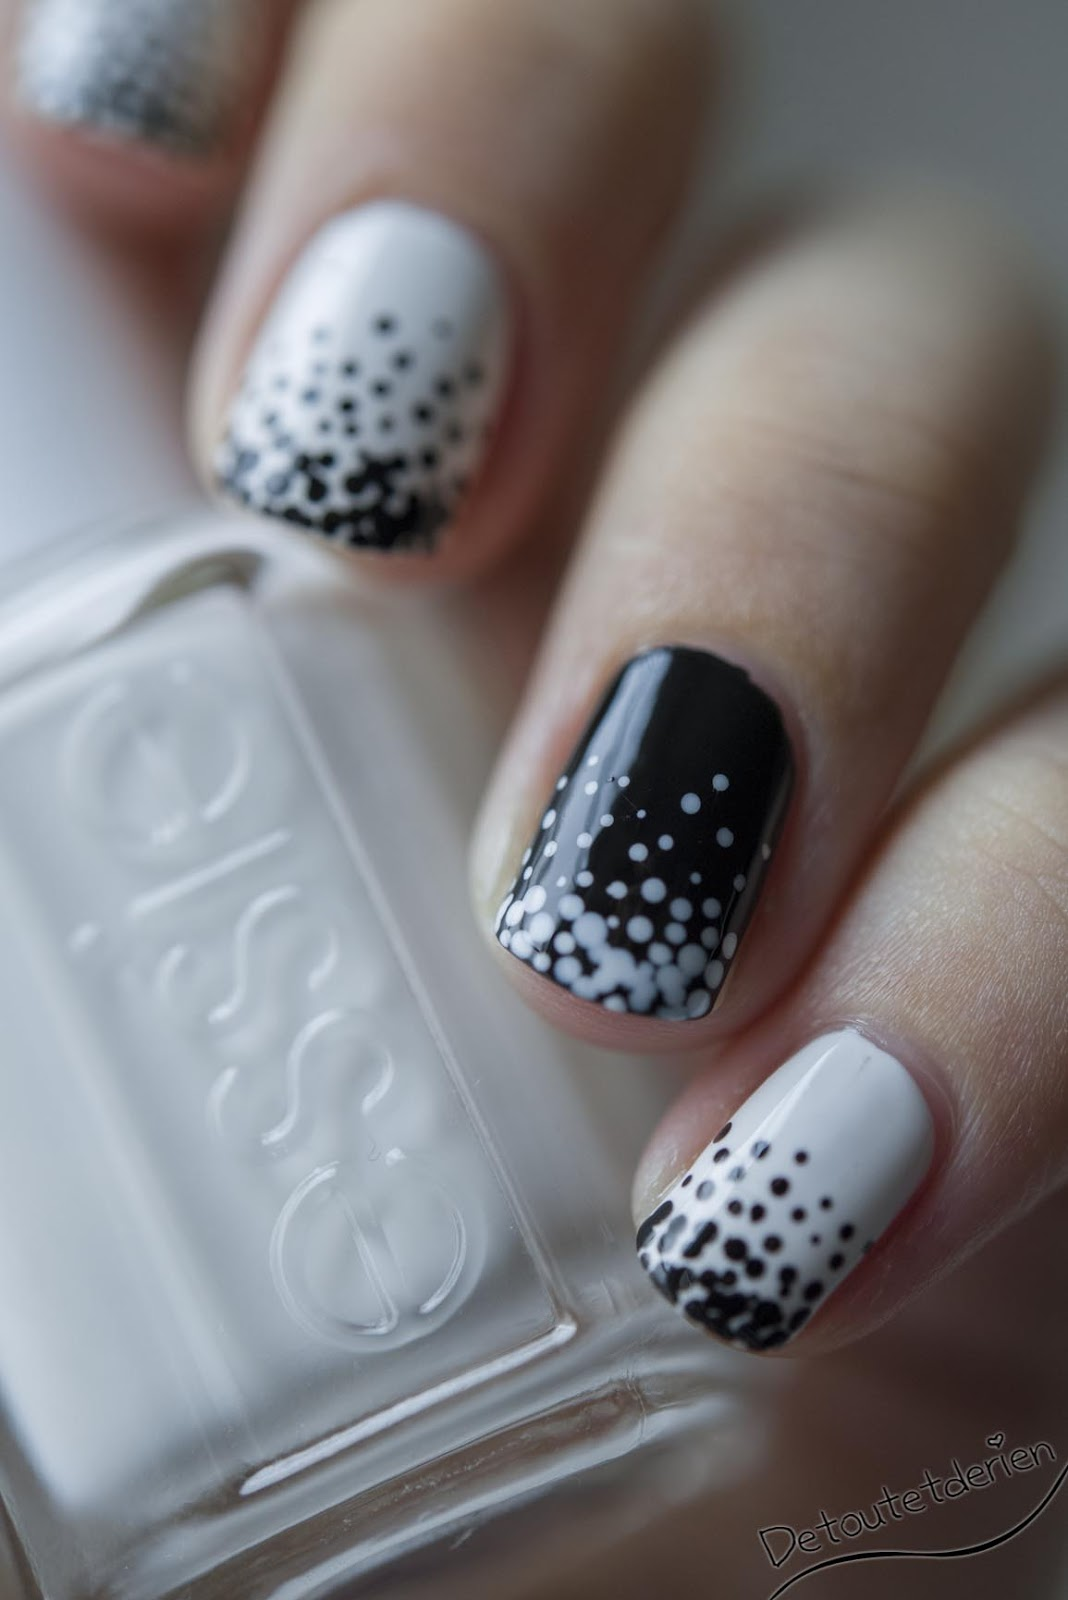 Cute nail art designs to do at home - Cute nail polish designs to do at home ...